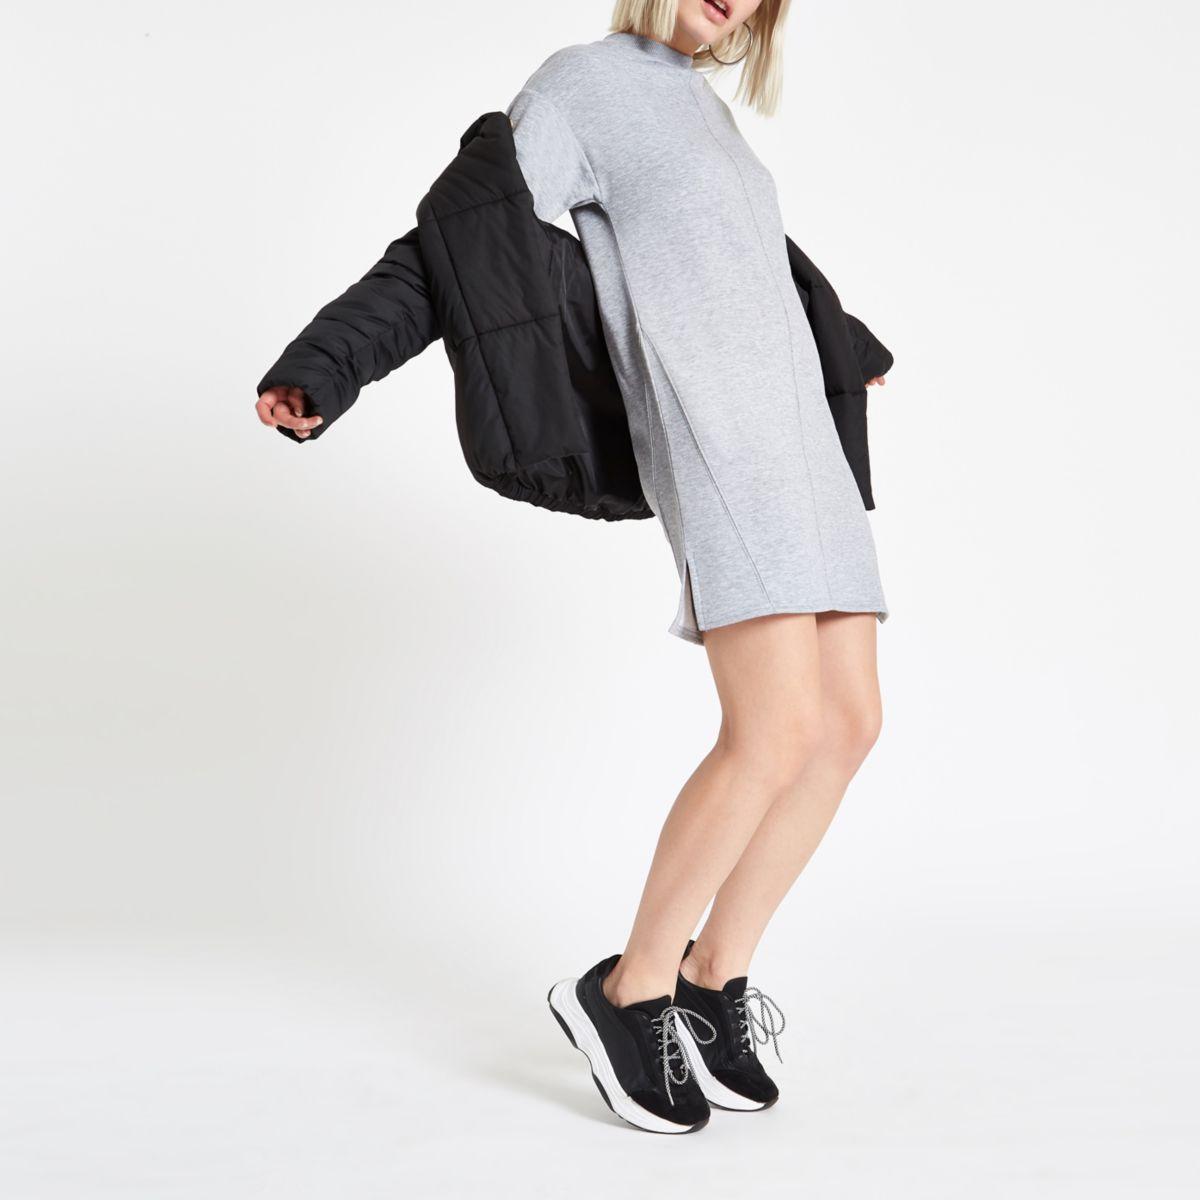 Grey marl high neck sweater dress